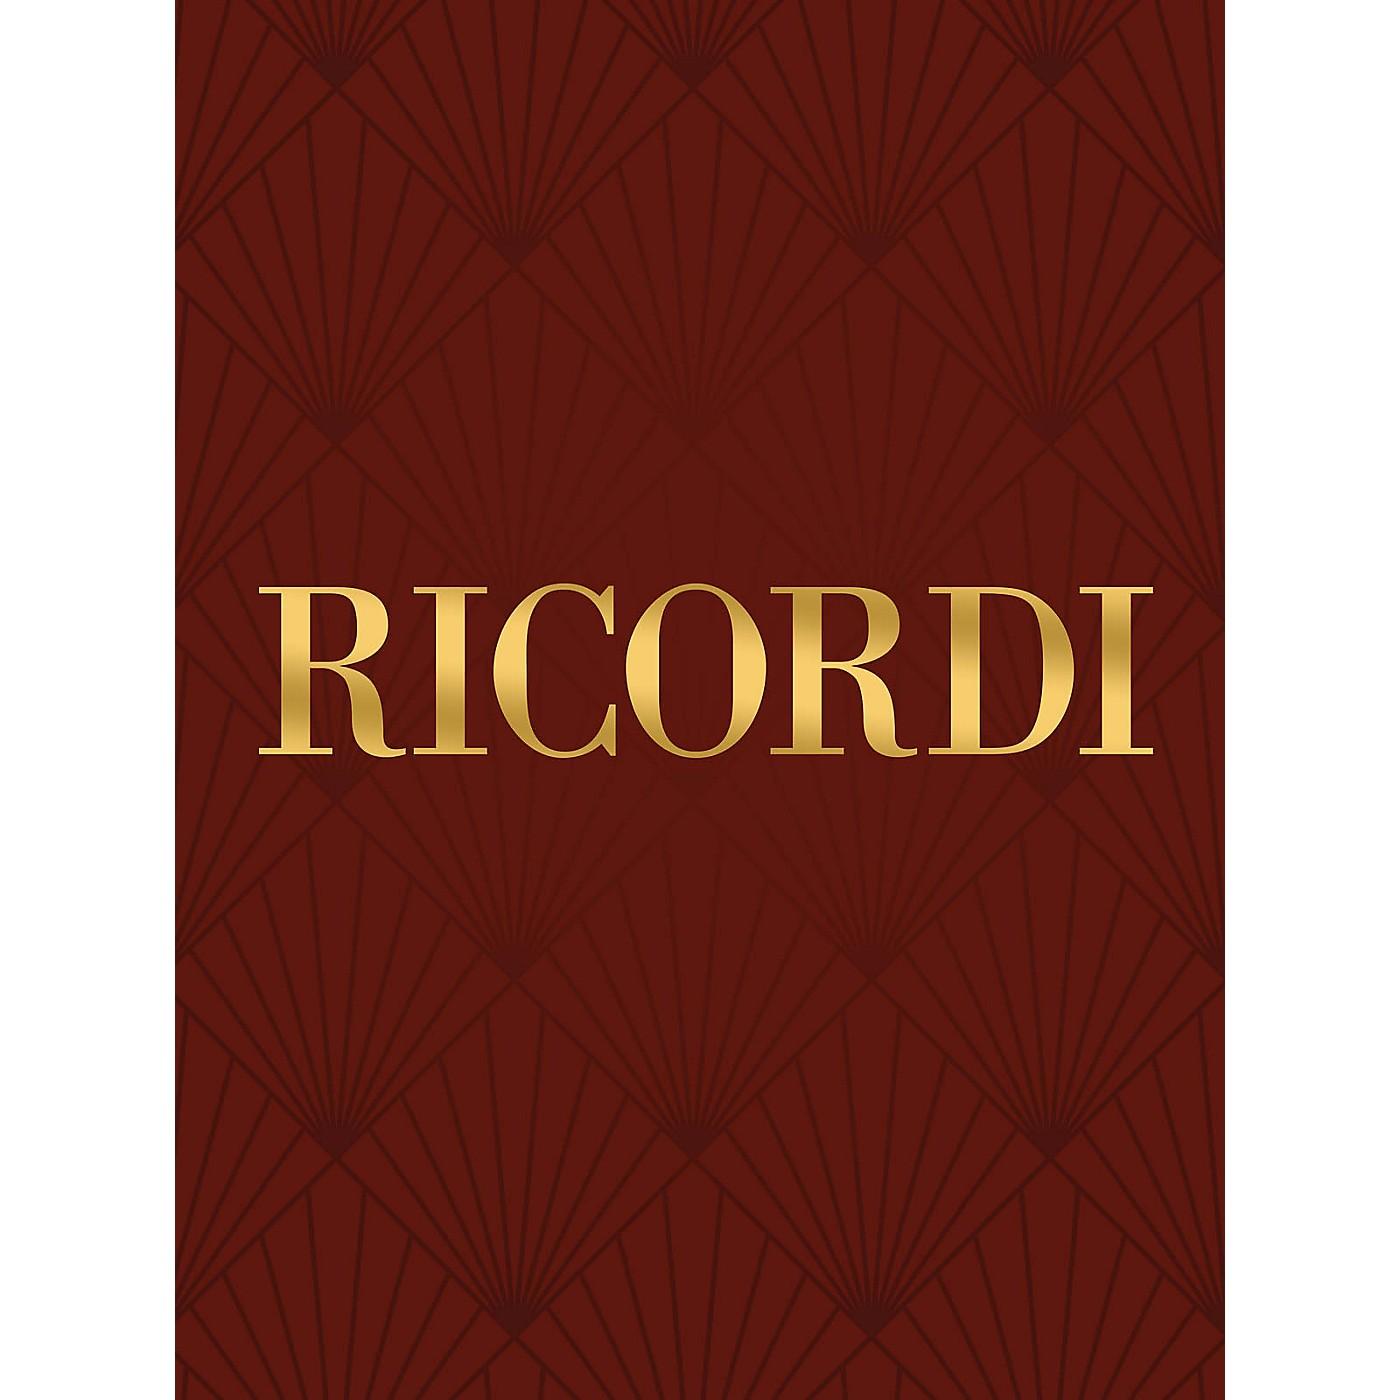 Ricordi La Scuola del Flauto, Op. 51 - Level II Woodwind Method Composed by L Hugues Edited by Alberto Veggetti thumbnail